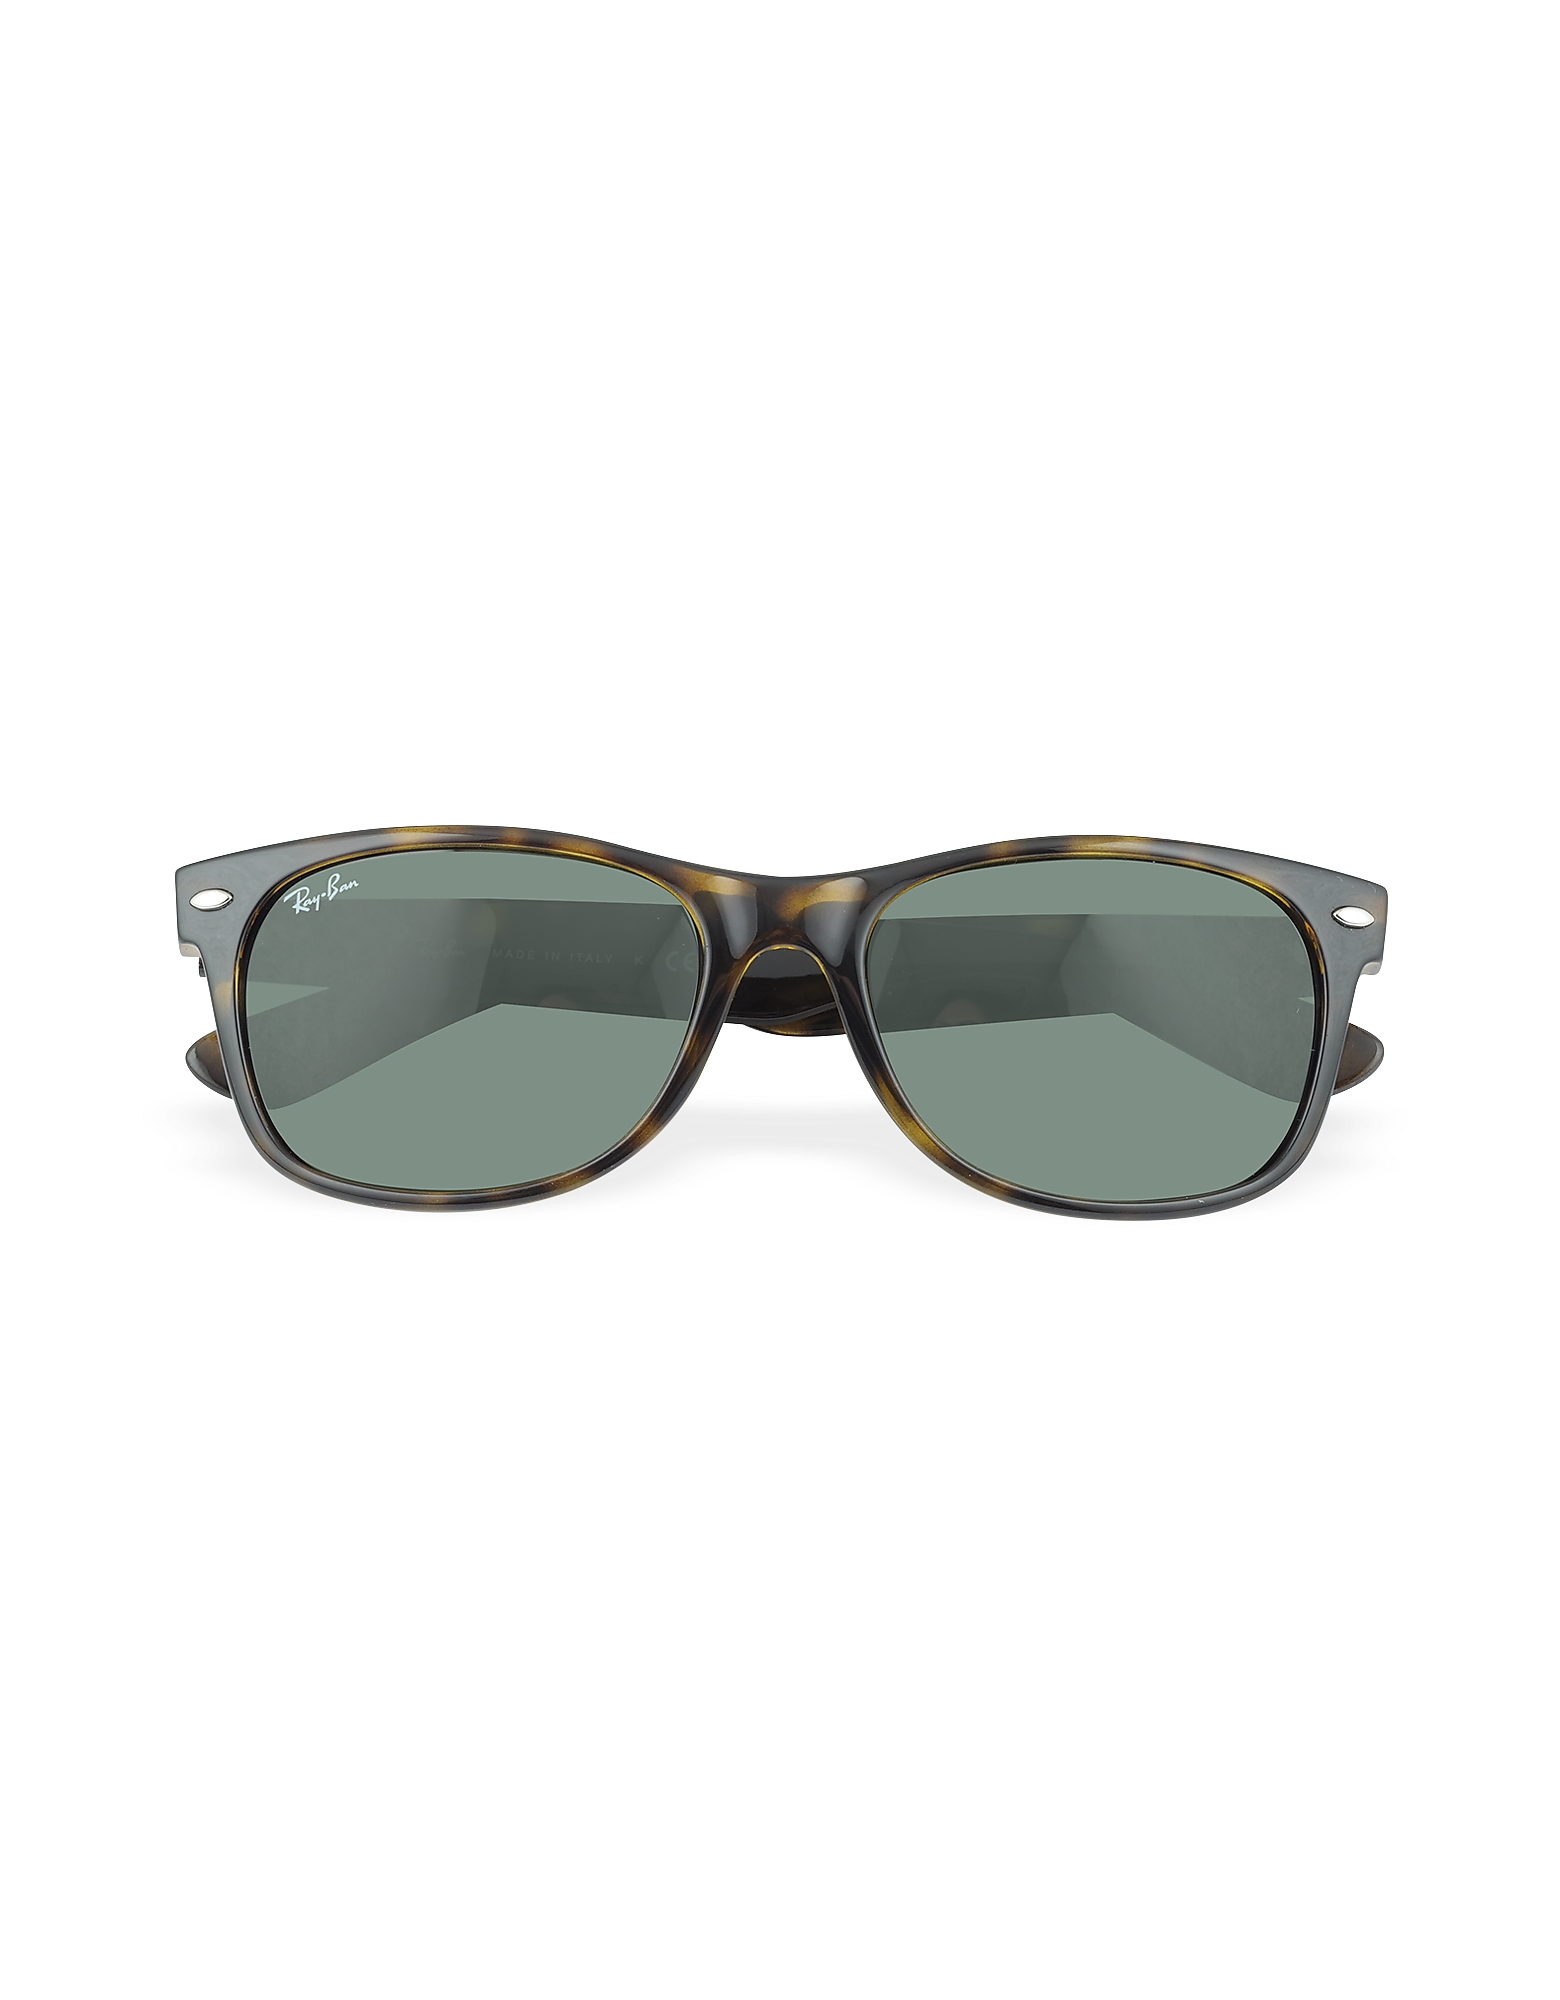 Ray Ban Sunglasses, New Wayfarer - Square Acetate Sunglasses